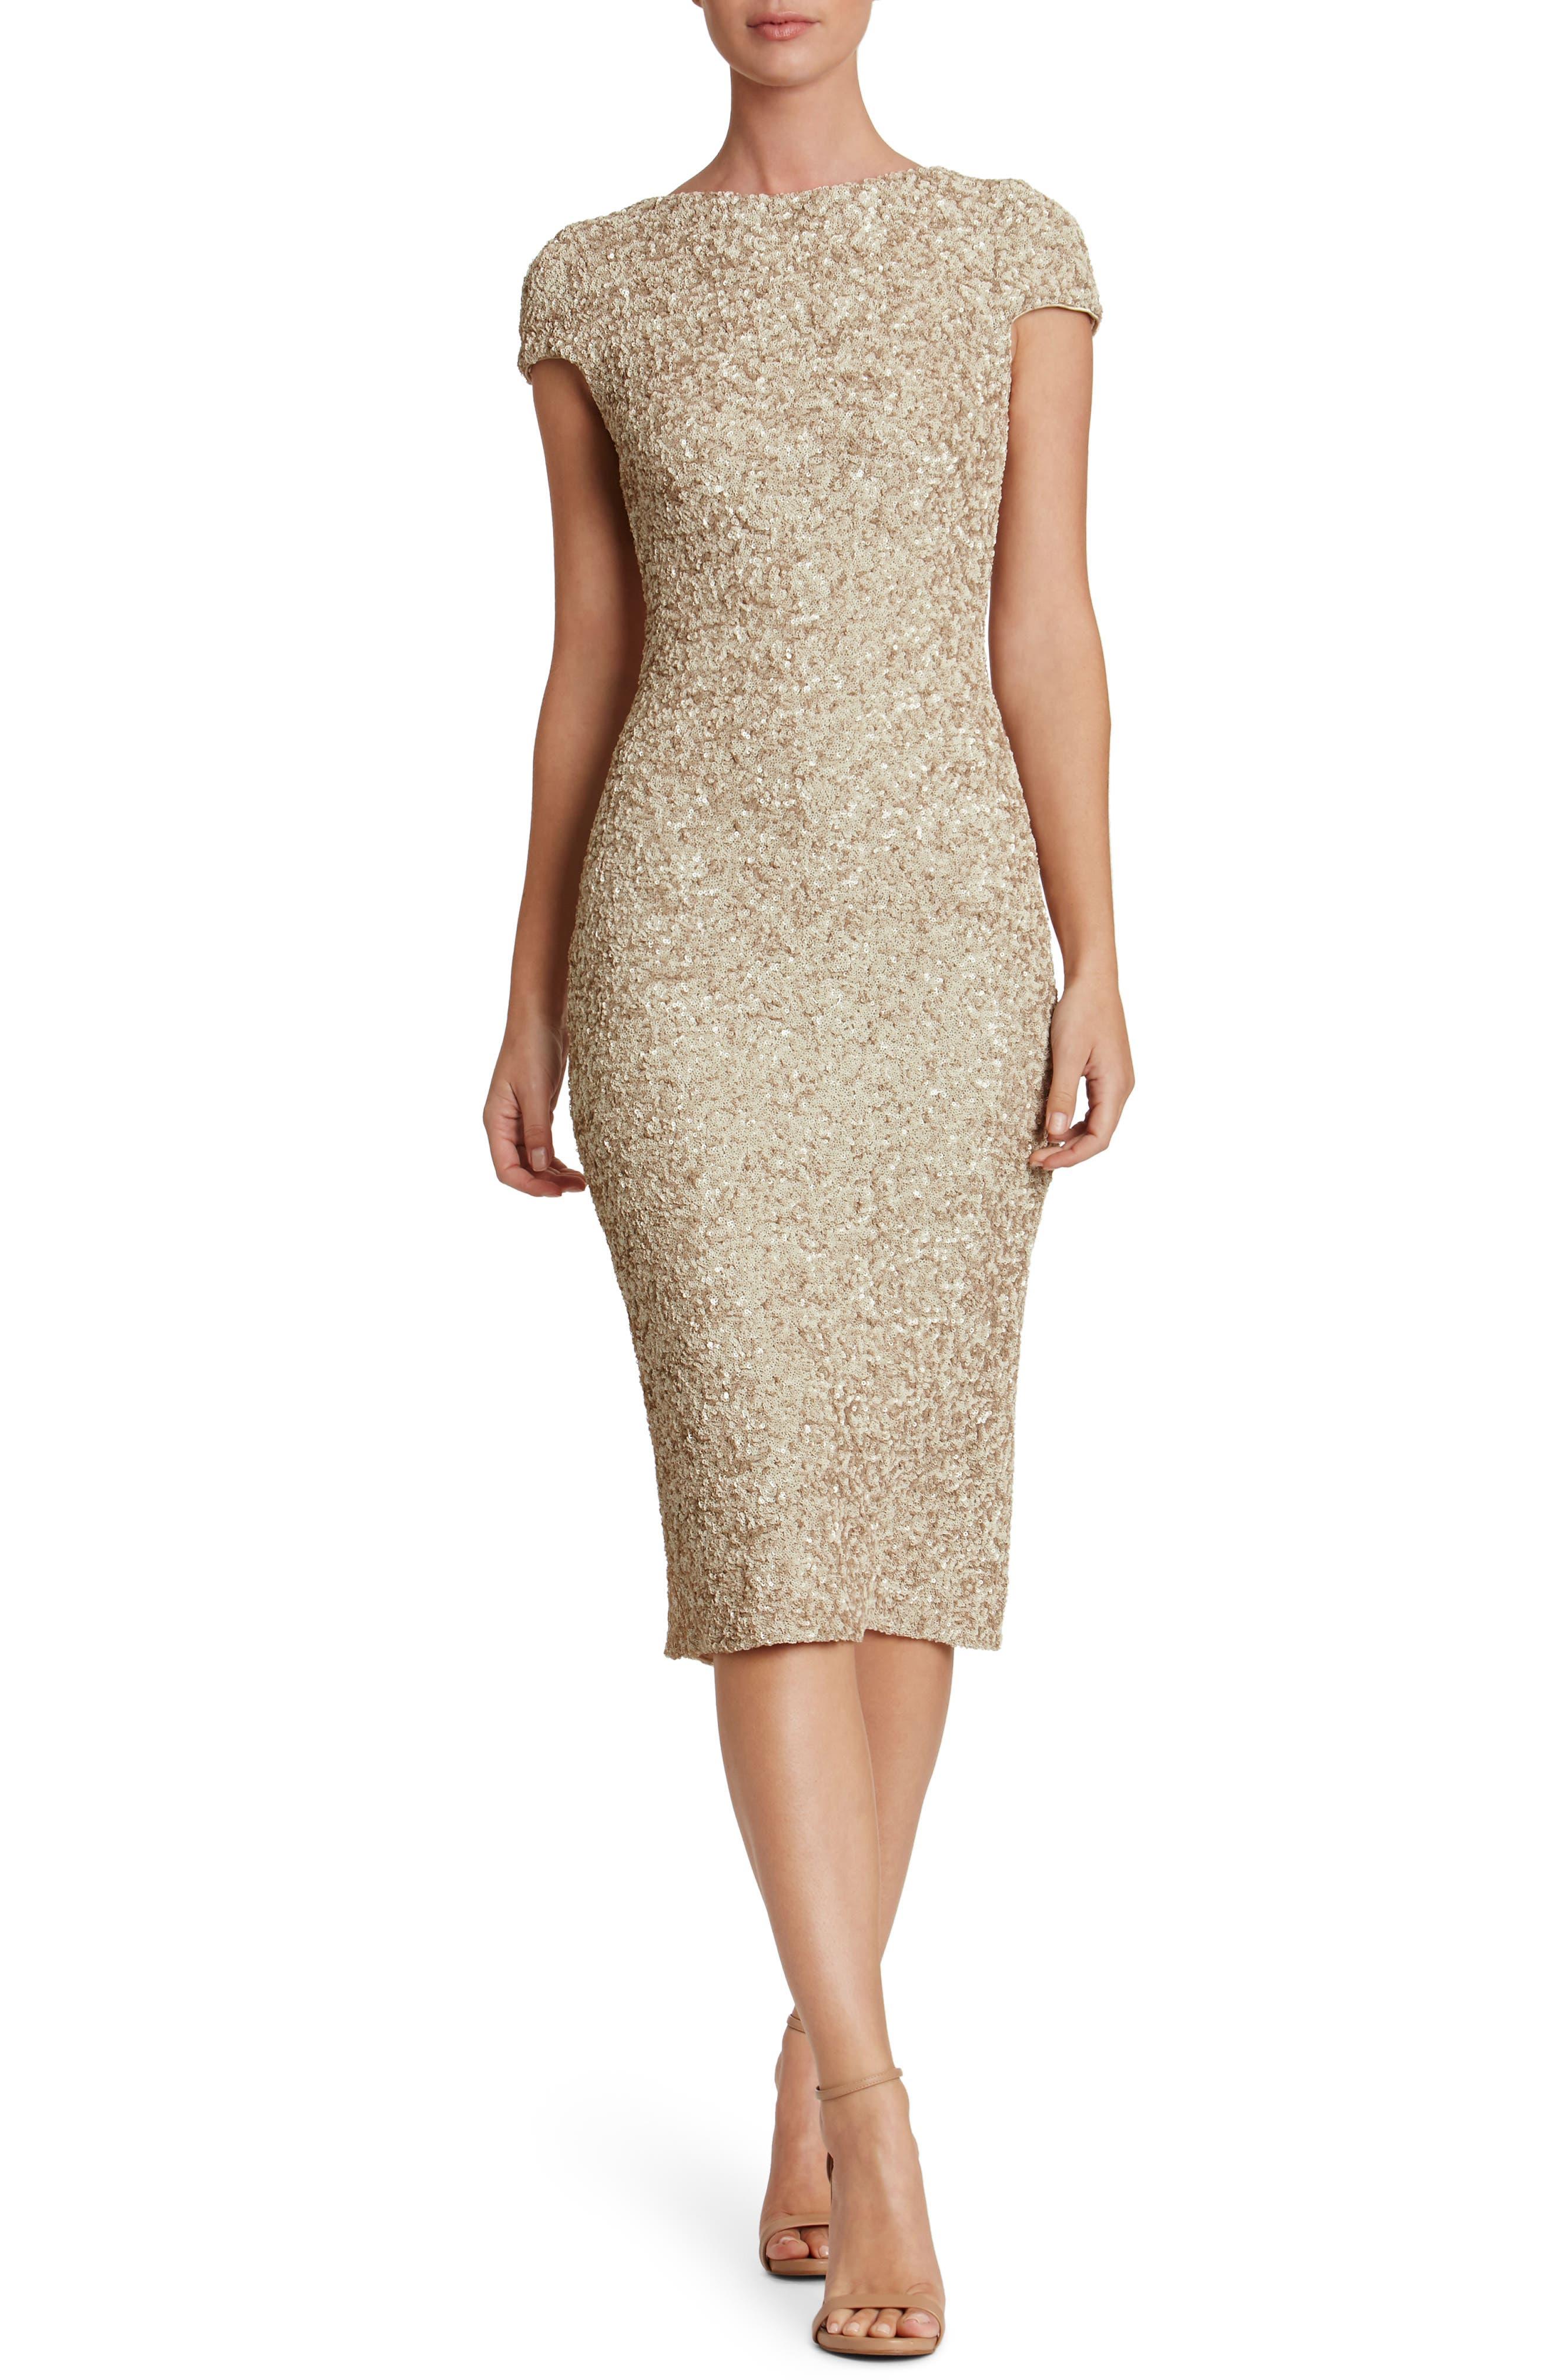 Alternate Image 1 Selected - Dress the Population Marcella Sequin Midi Dress